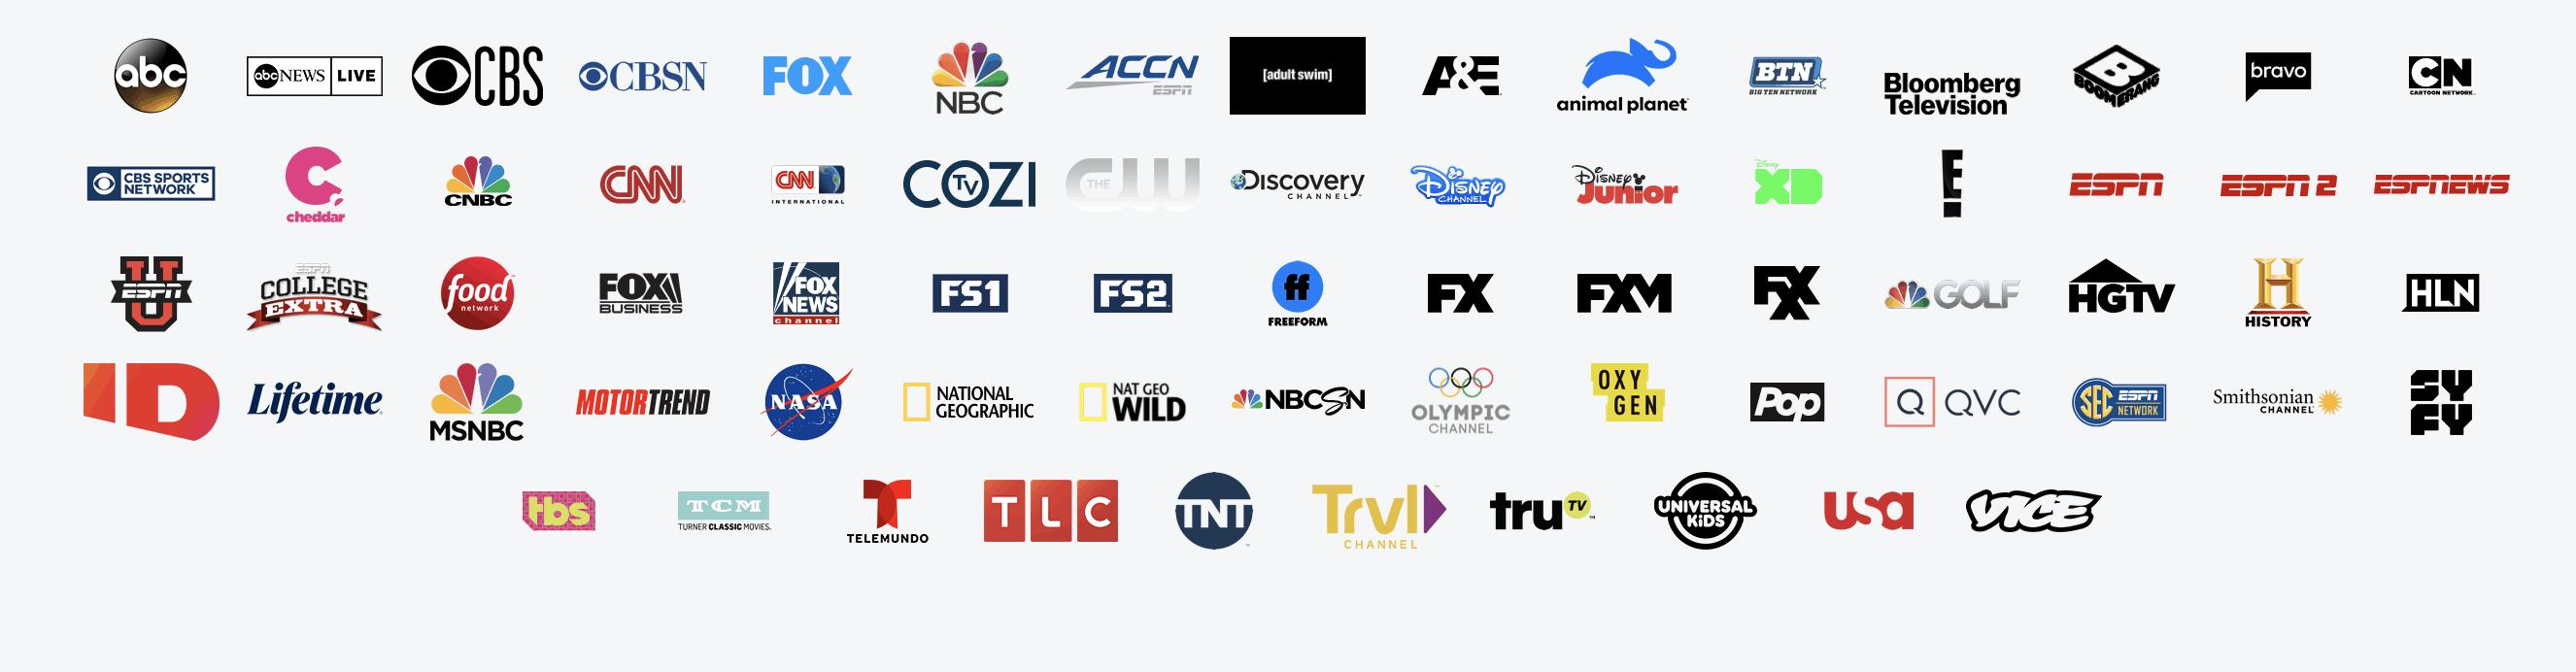 hulu + live tv channels